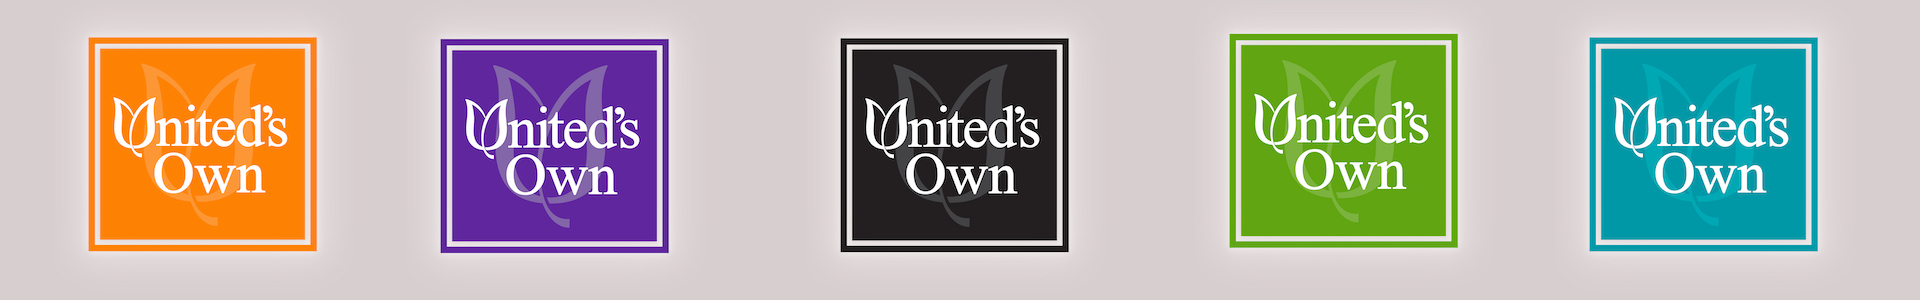 united-markets-brand-refresh-logos-golden-shores-communications-brand-agency